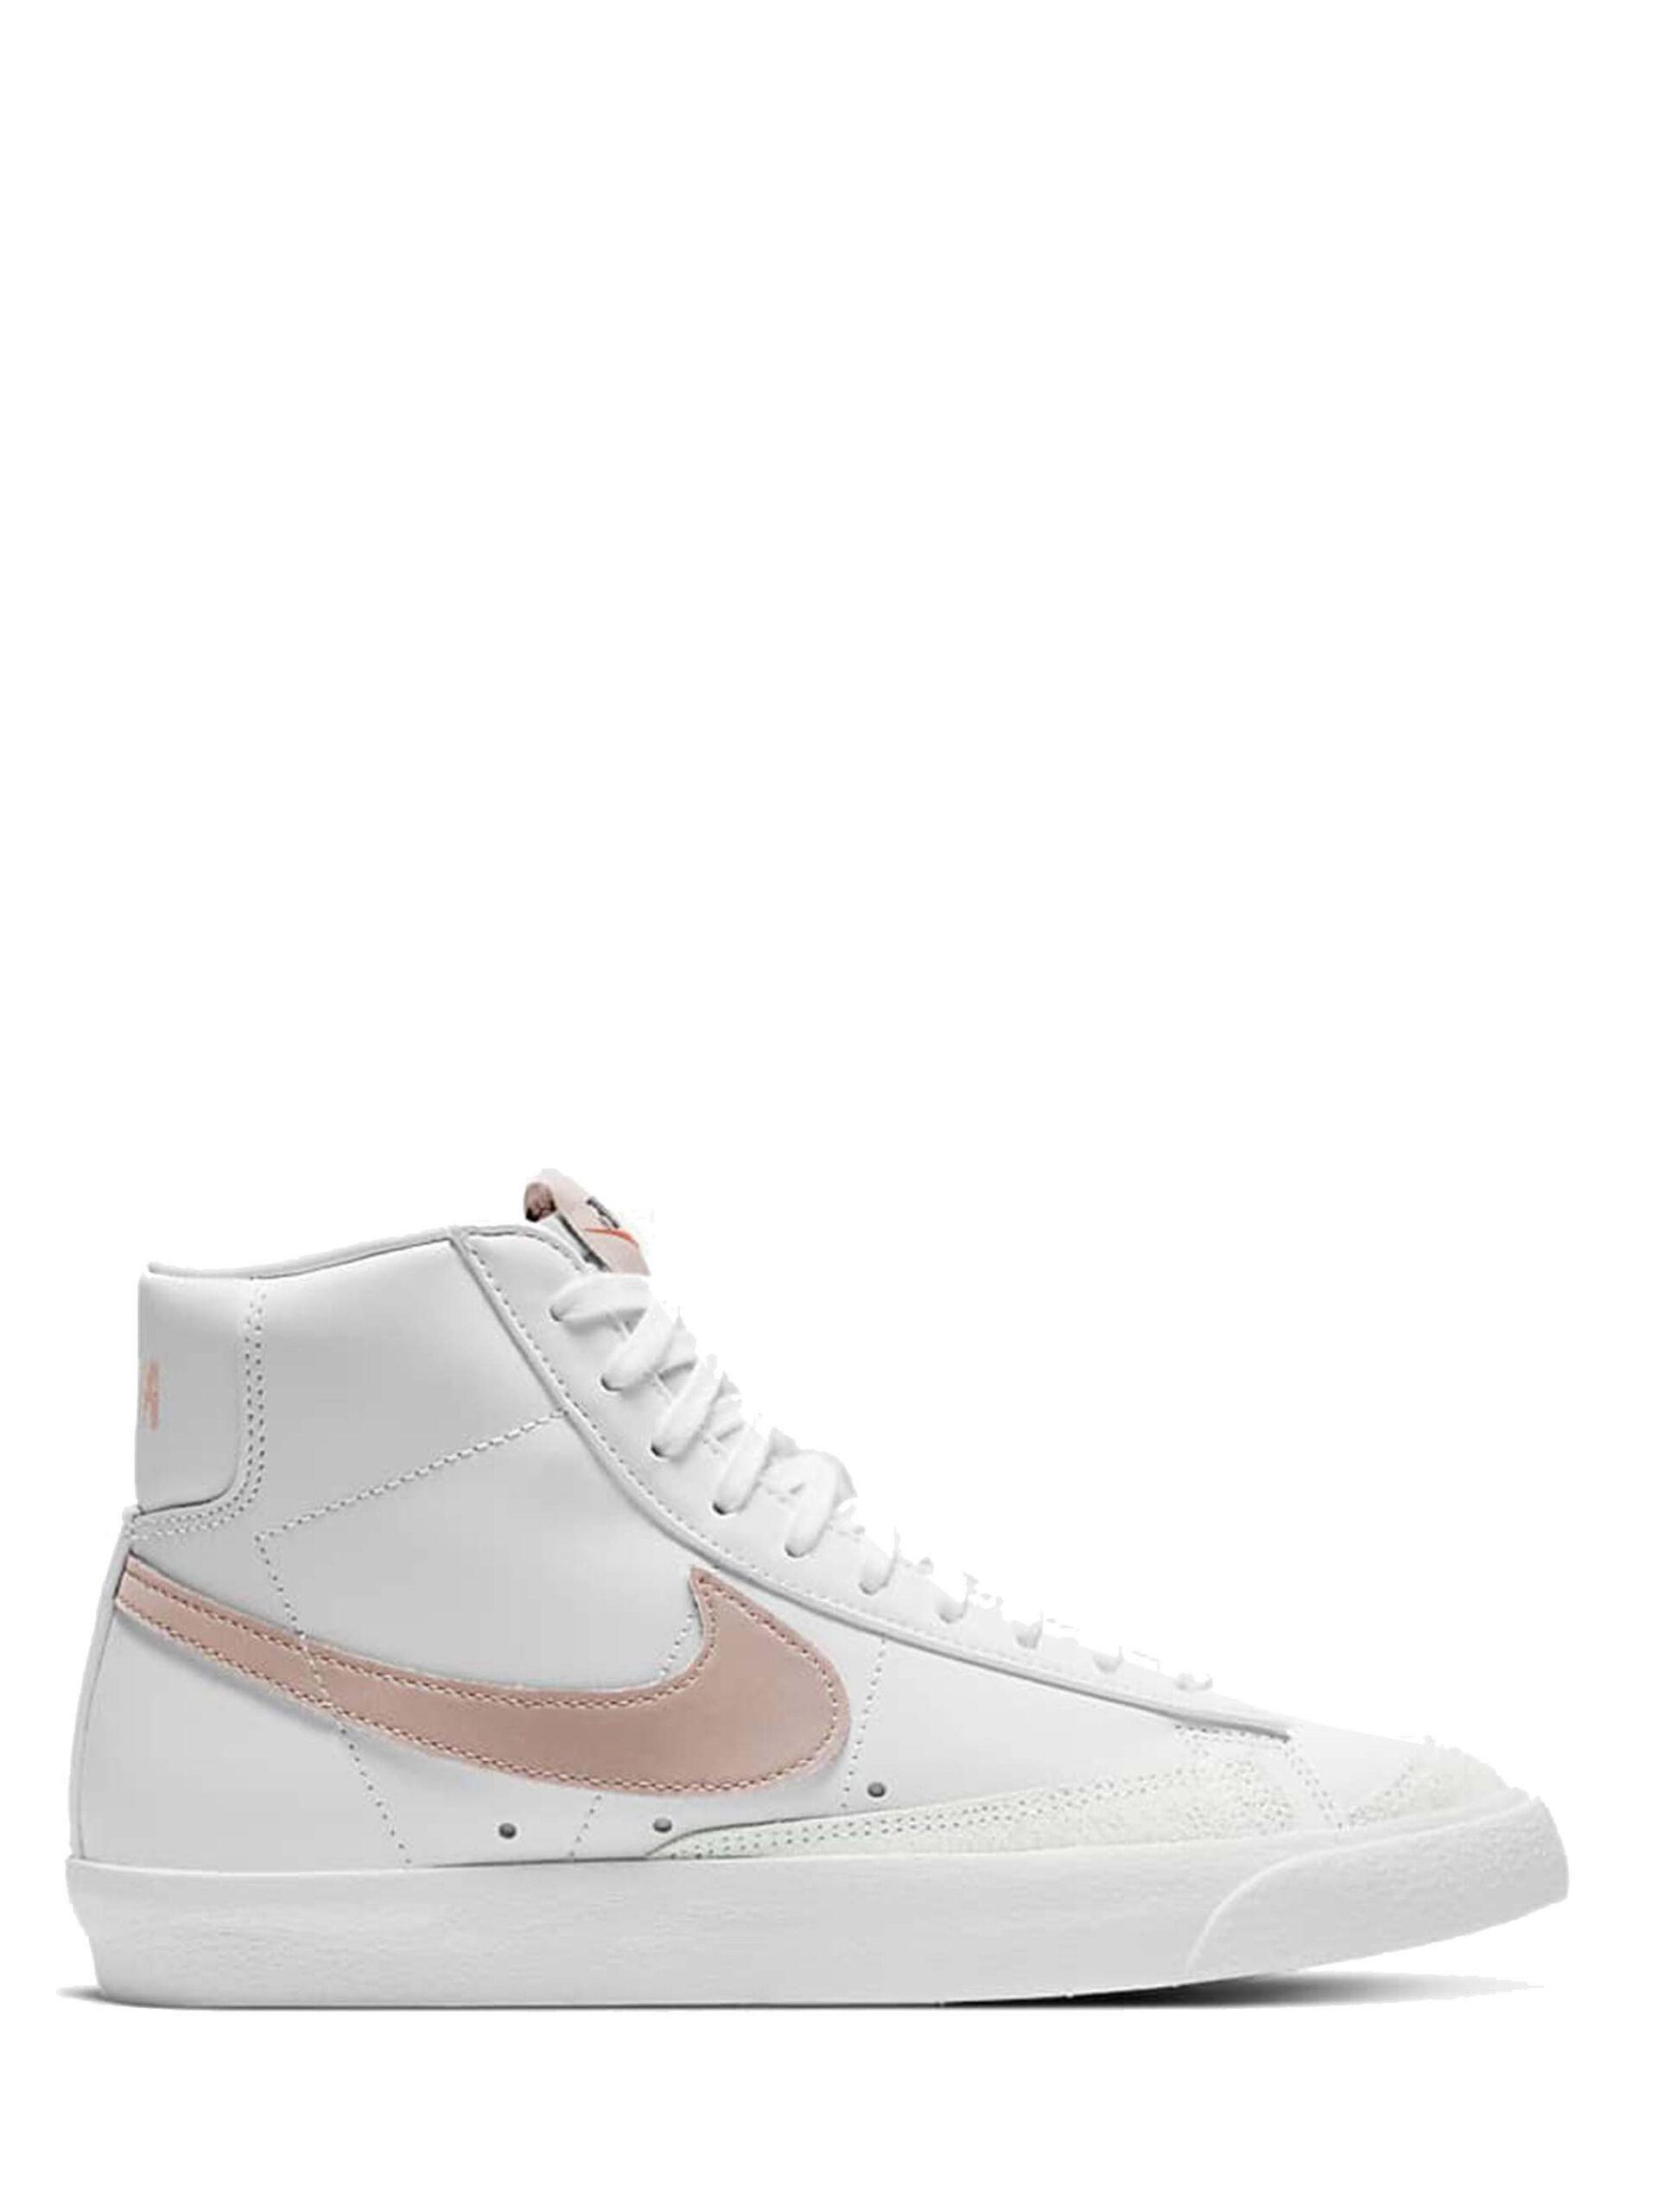 <p class='small-title'>NIKE</p>Nike Blazer Mid '77 Vintage